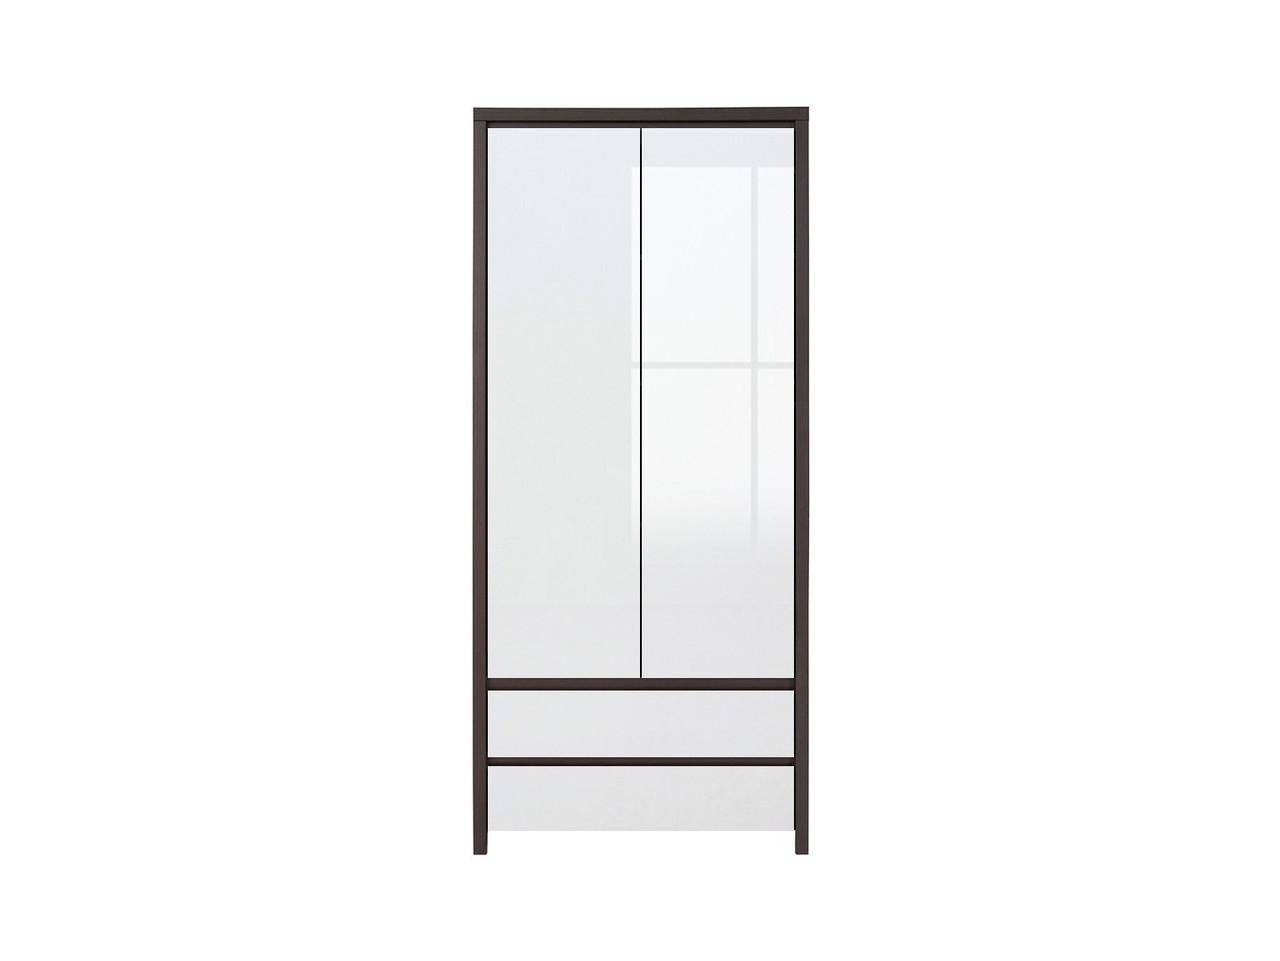 Шкаф Kaspian 90х200,5 см